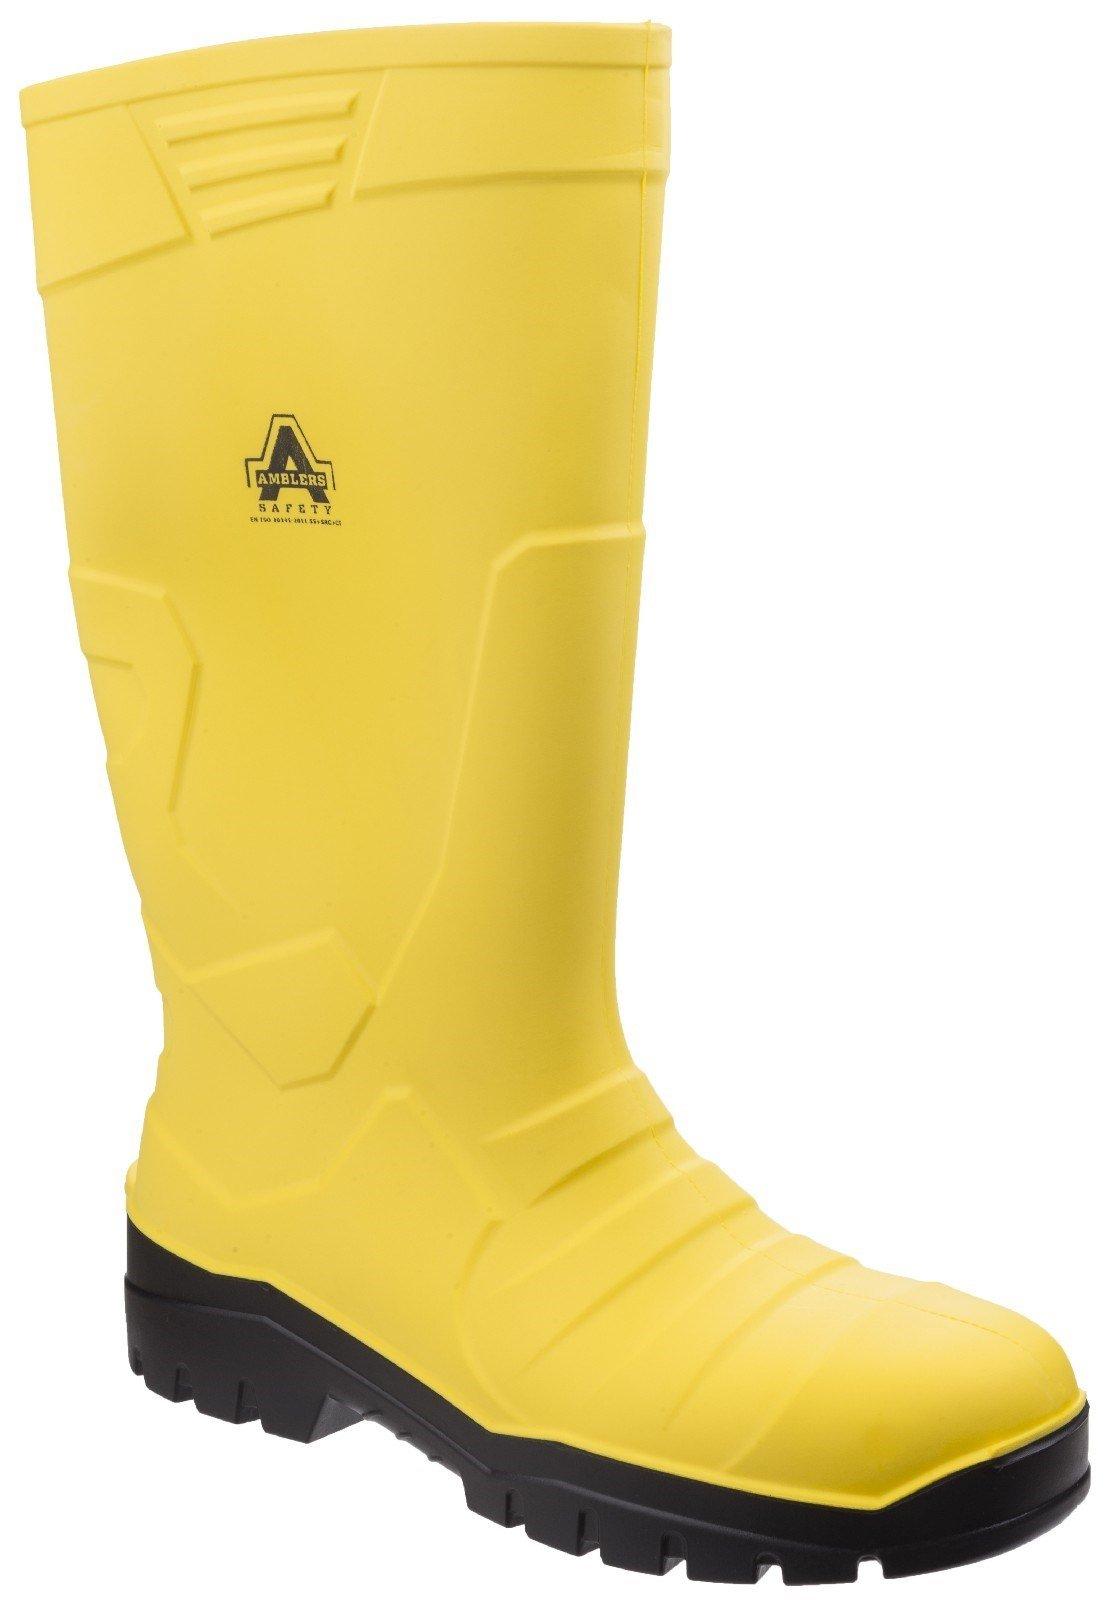 Amblers Unisex Safety Full Wellington Boots Yellow 27040 - Yellow 3